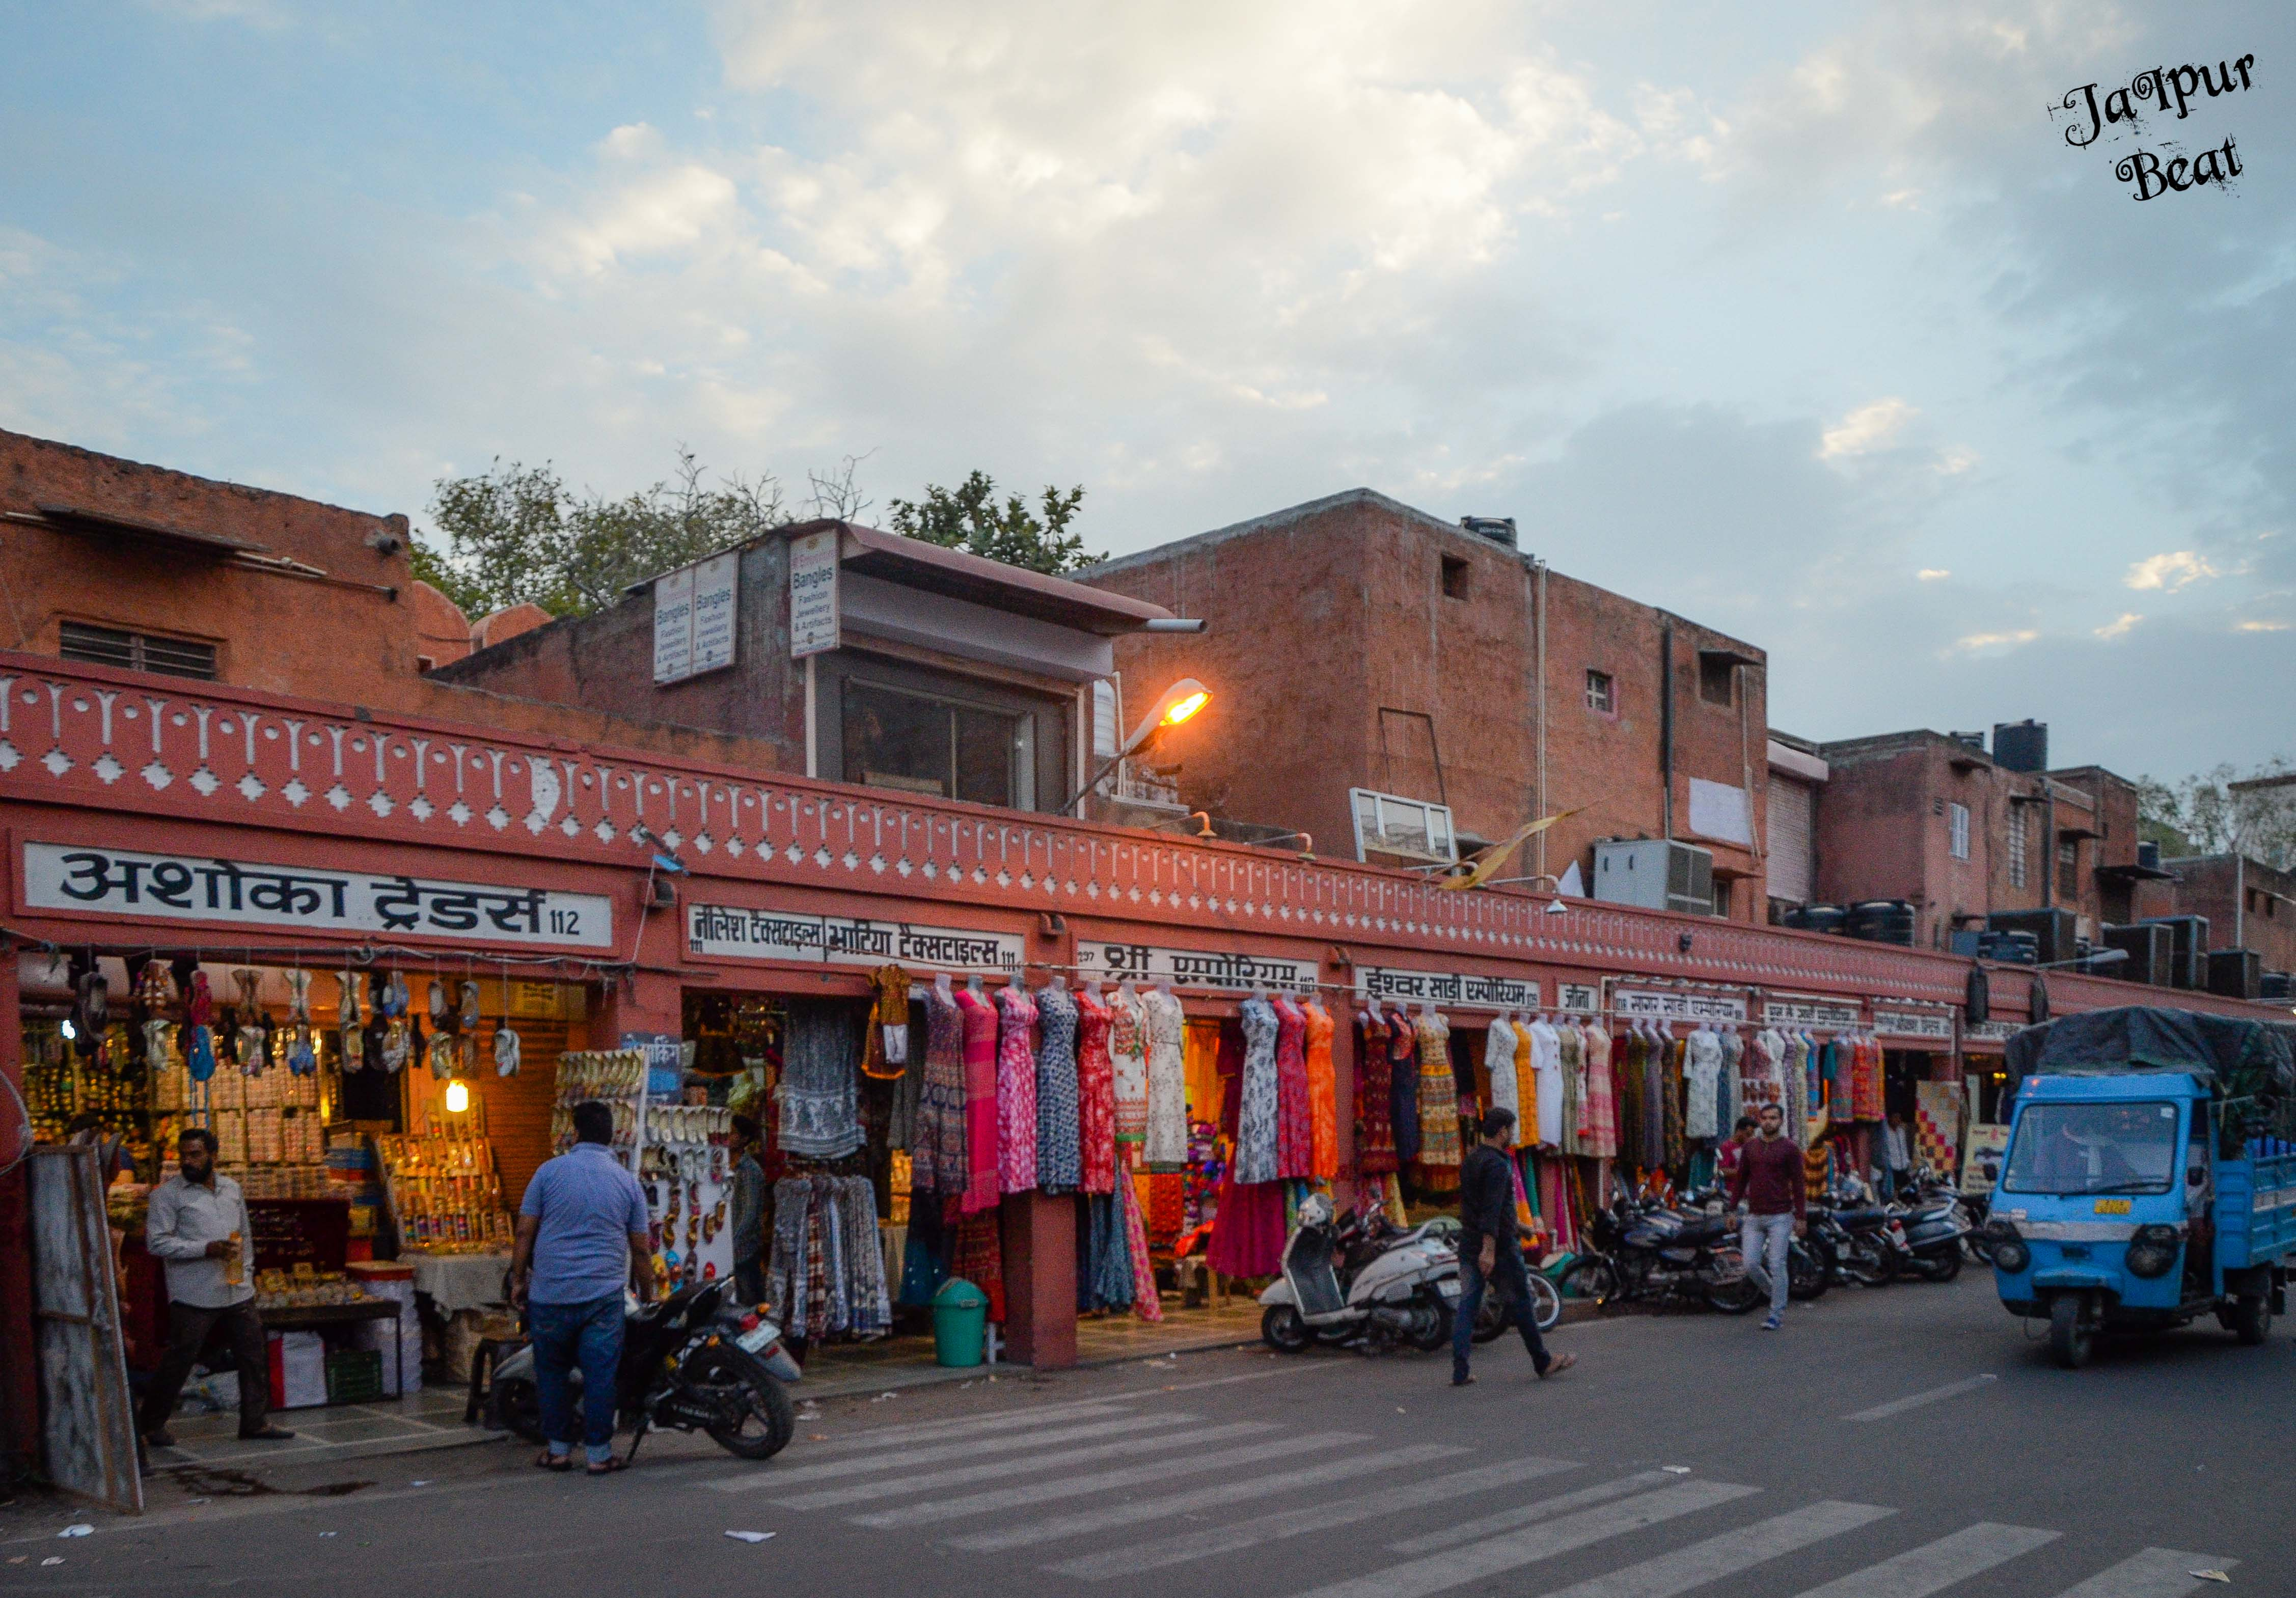 Bapu Bazaar by Jaipur Beat market